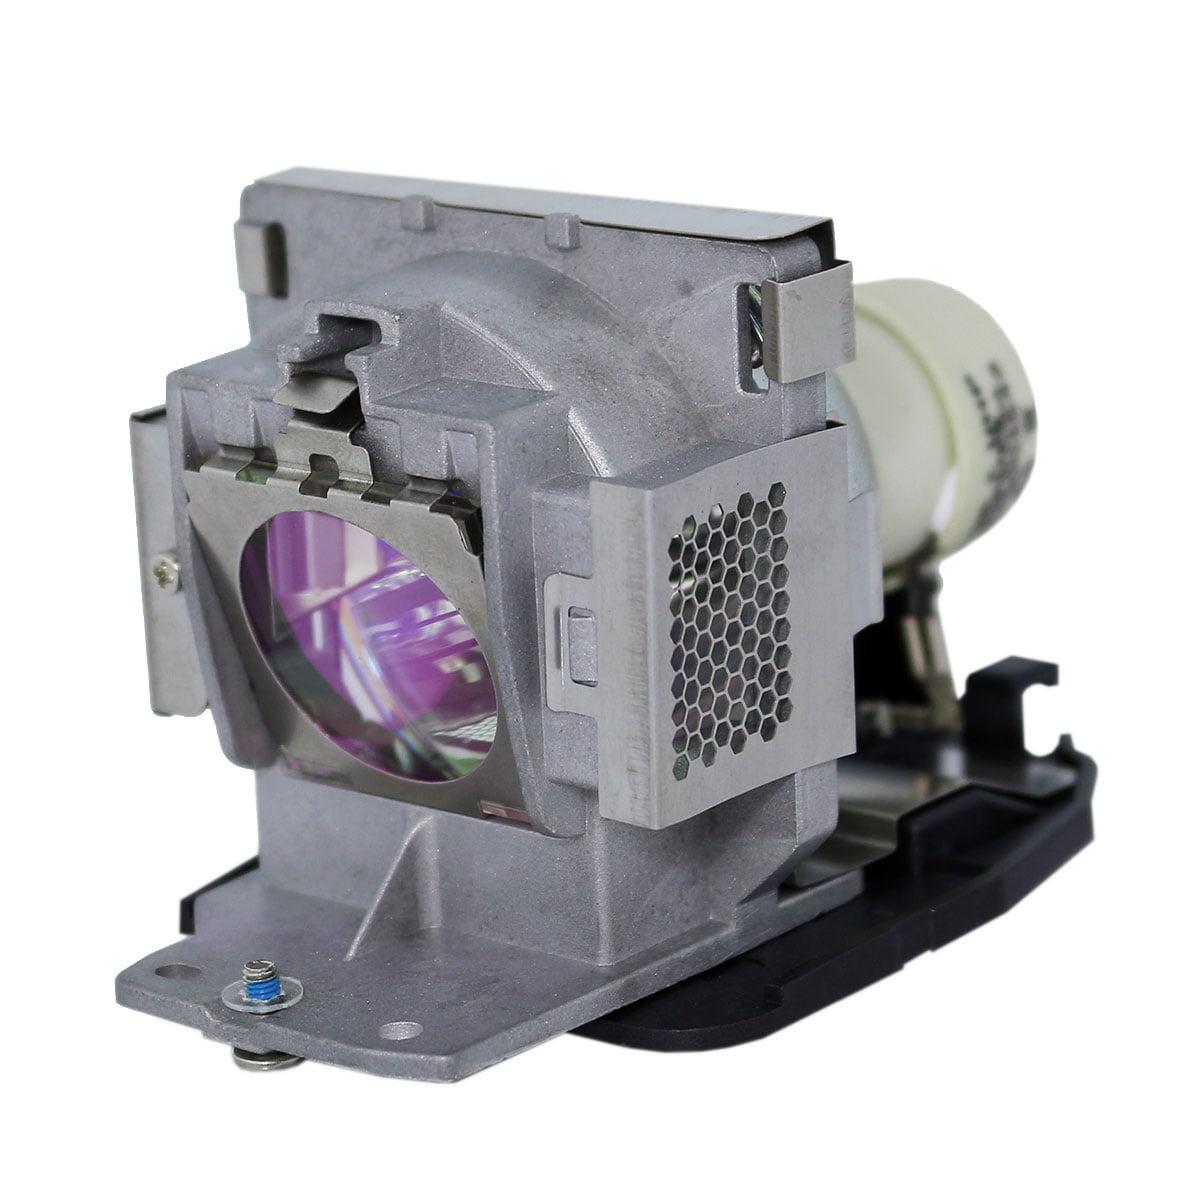 Lutema Platinum Bulb for BenQ MP711c Projector Lamp (Original Philips Inside) - image 5 of 5